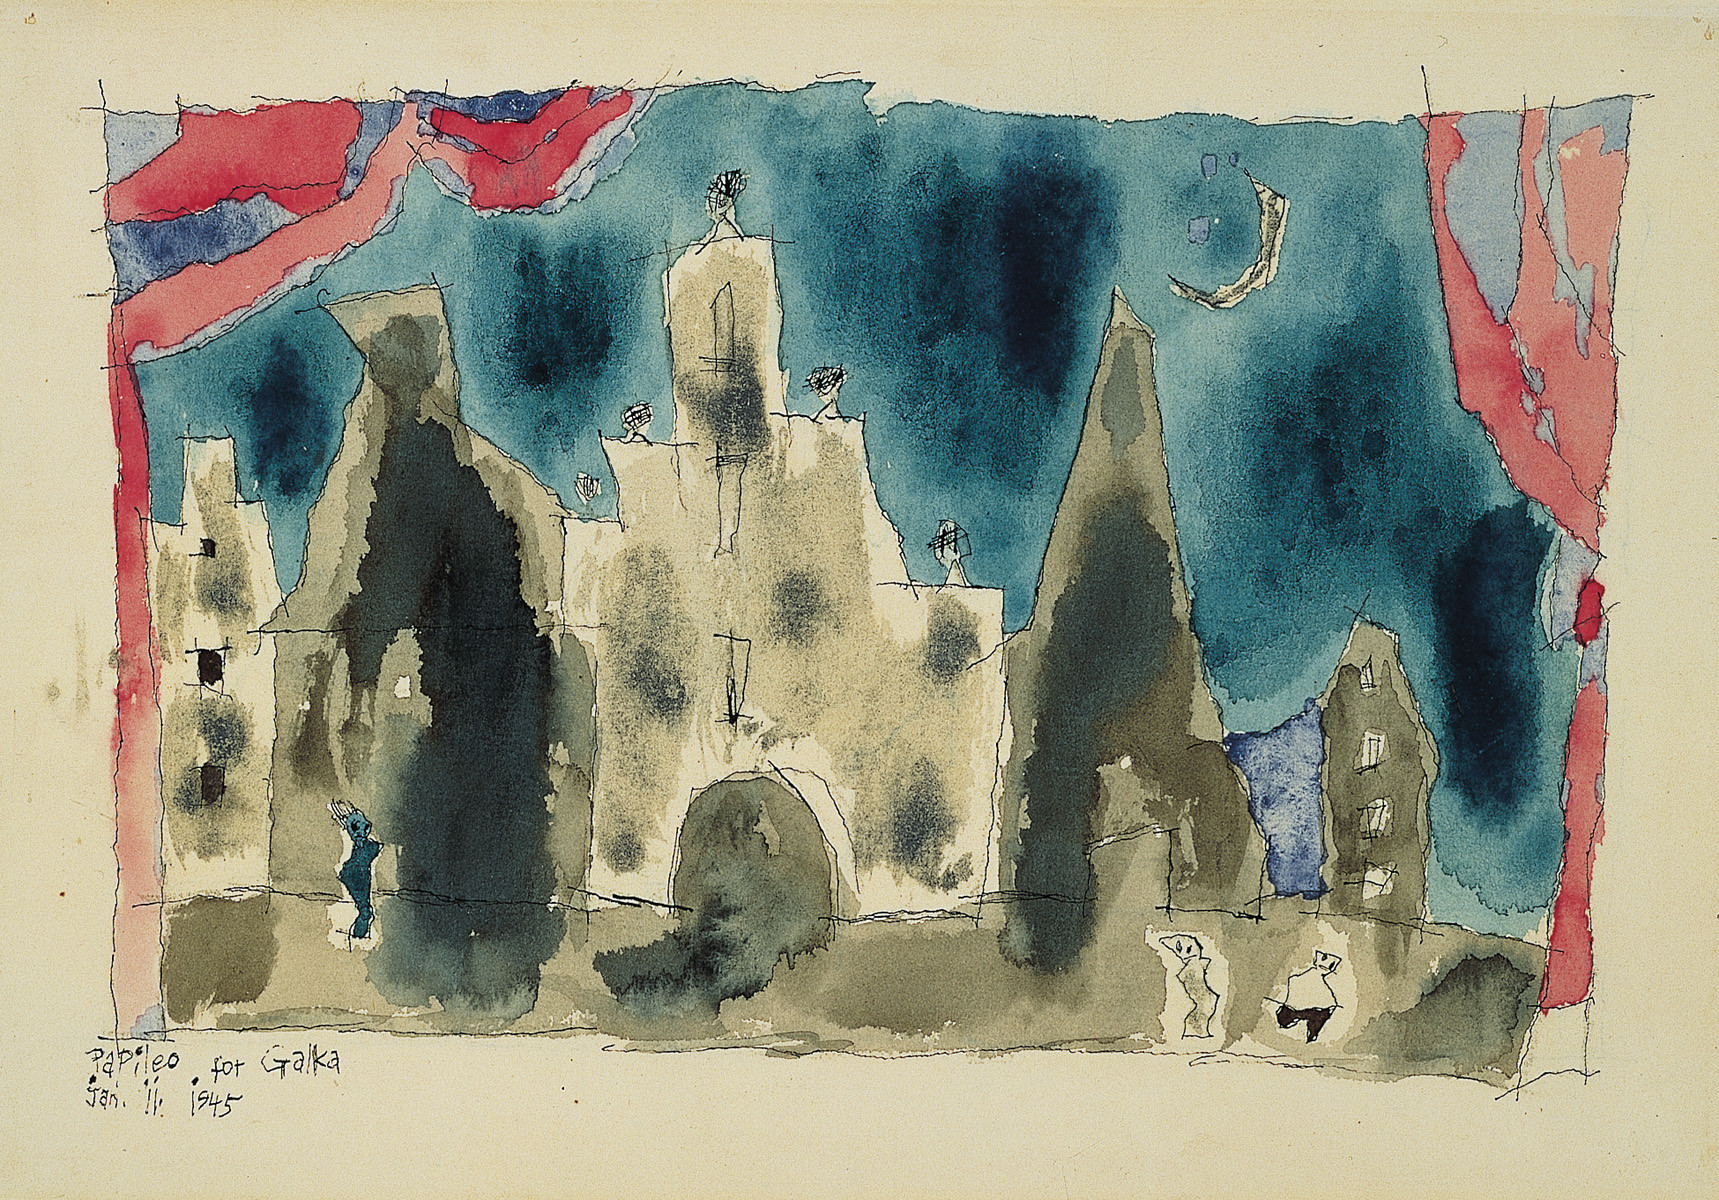 Untitled, 1945, by American artist Lyonel Feininger (1871-1956)